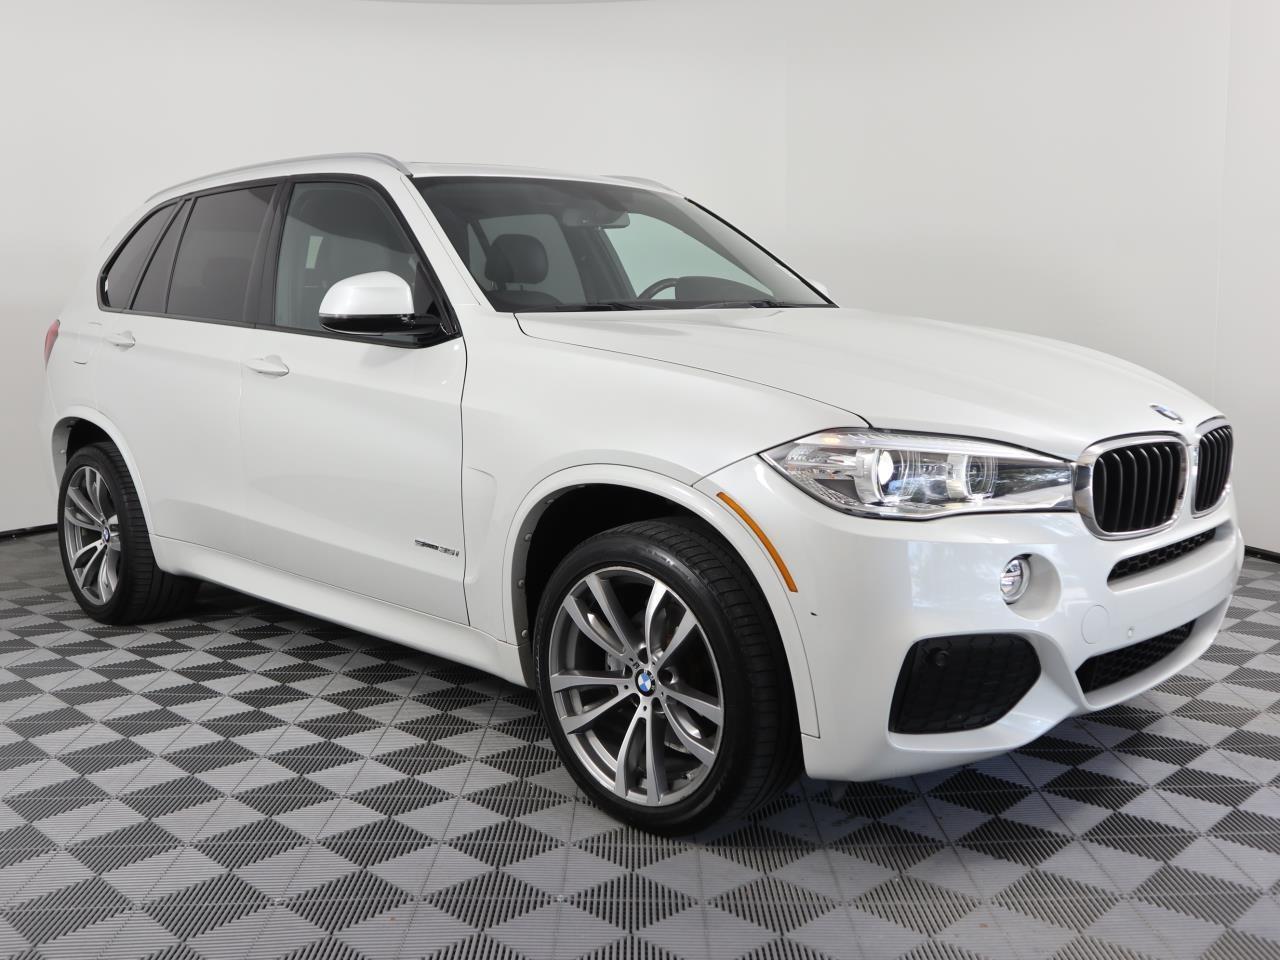 2014 BMW X5 RWD 4dr sDrive35i 6361 miles 2 Seatback Storage Pockets 4 12V DC Power Outlets LEATH